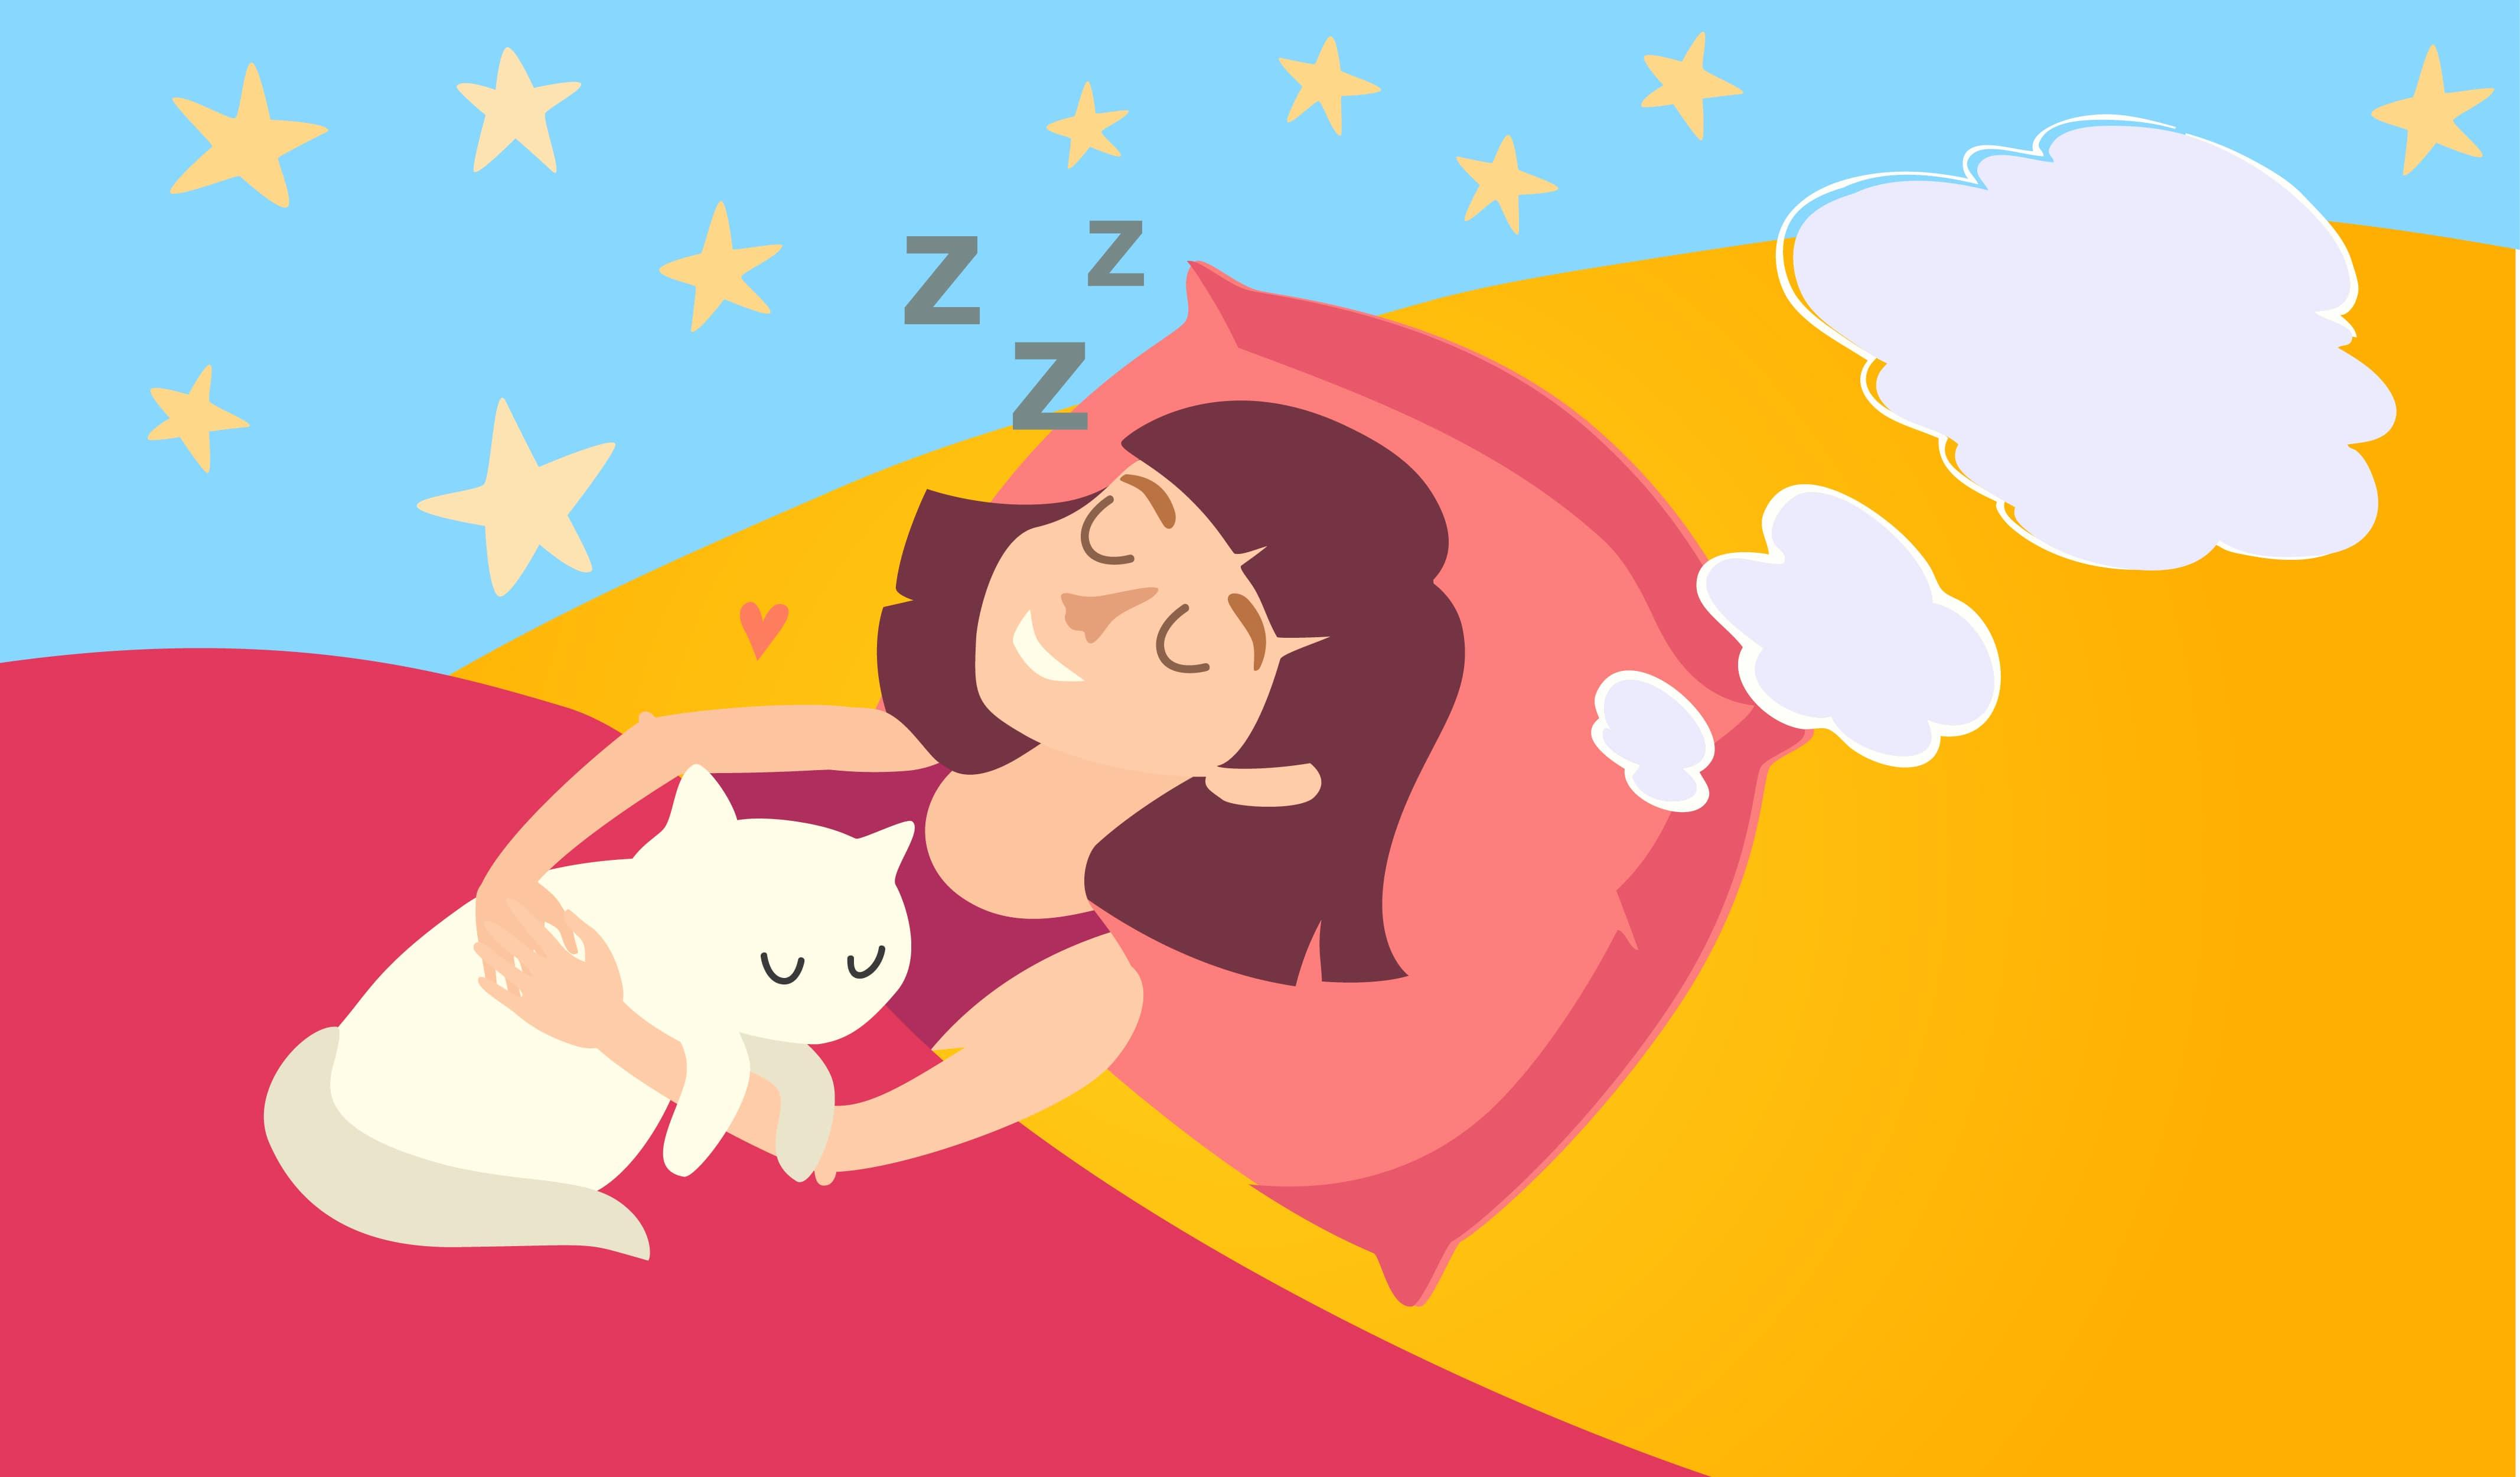 dream, sleep, cat